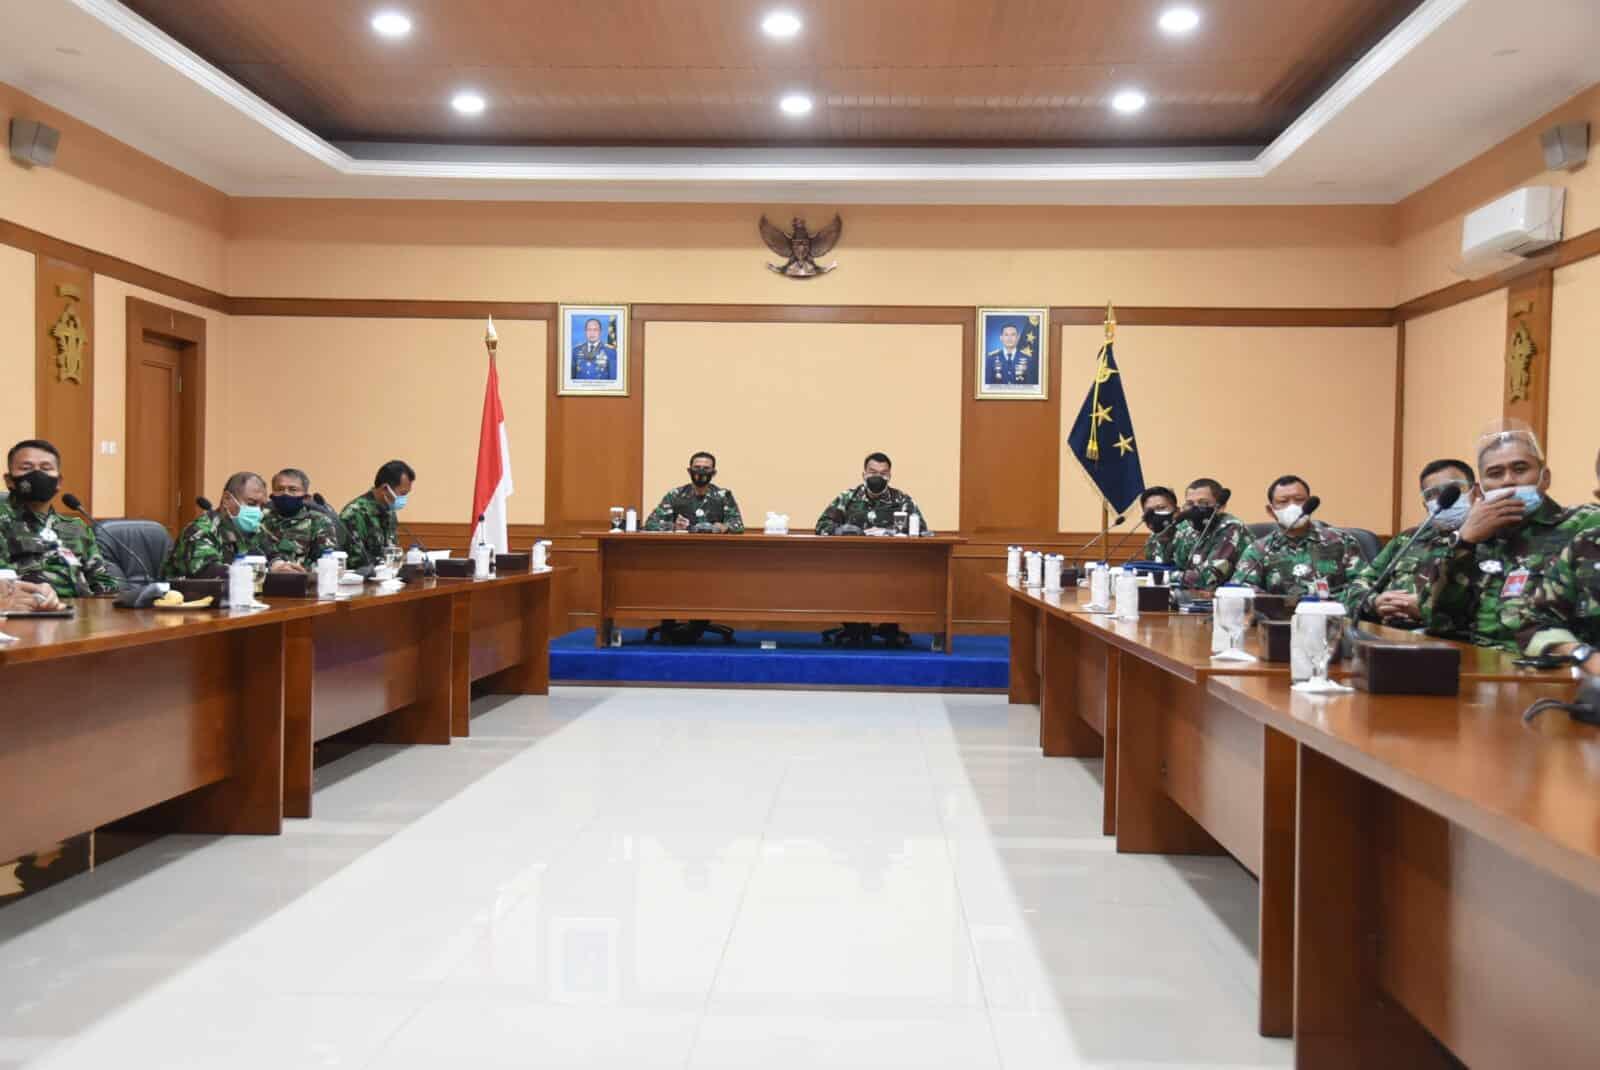 Dilaksanakan Secara Virtual Apel Khusus Kepala Staf TNI Angkatan Udara Tahun 2021.